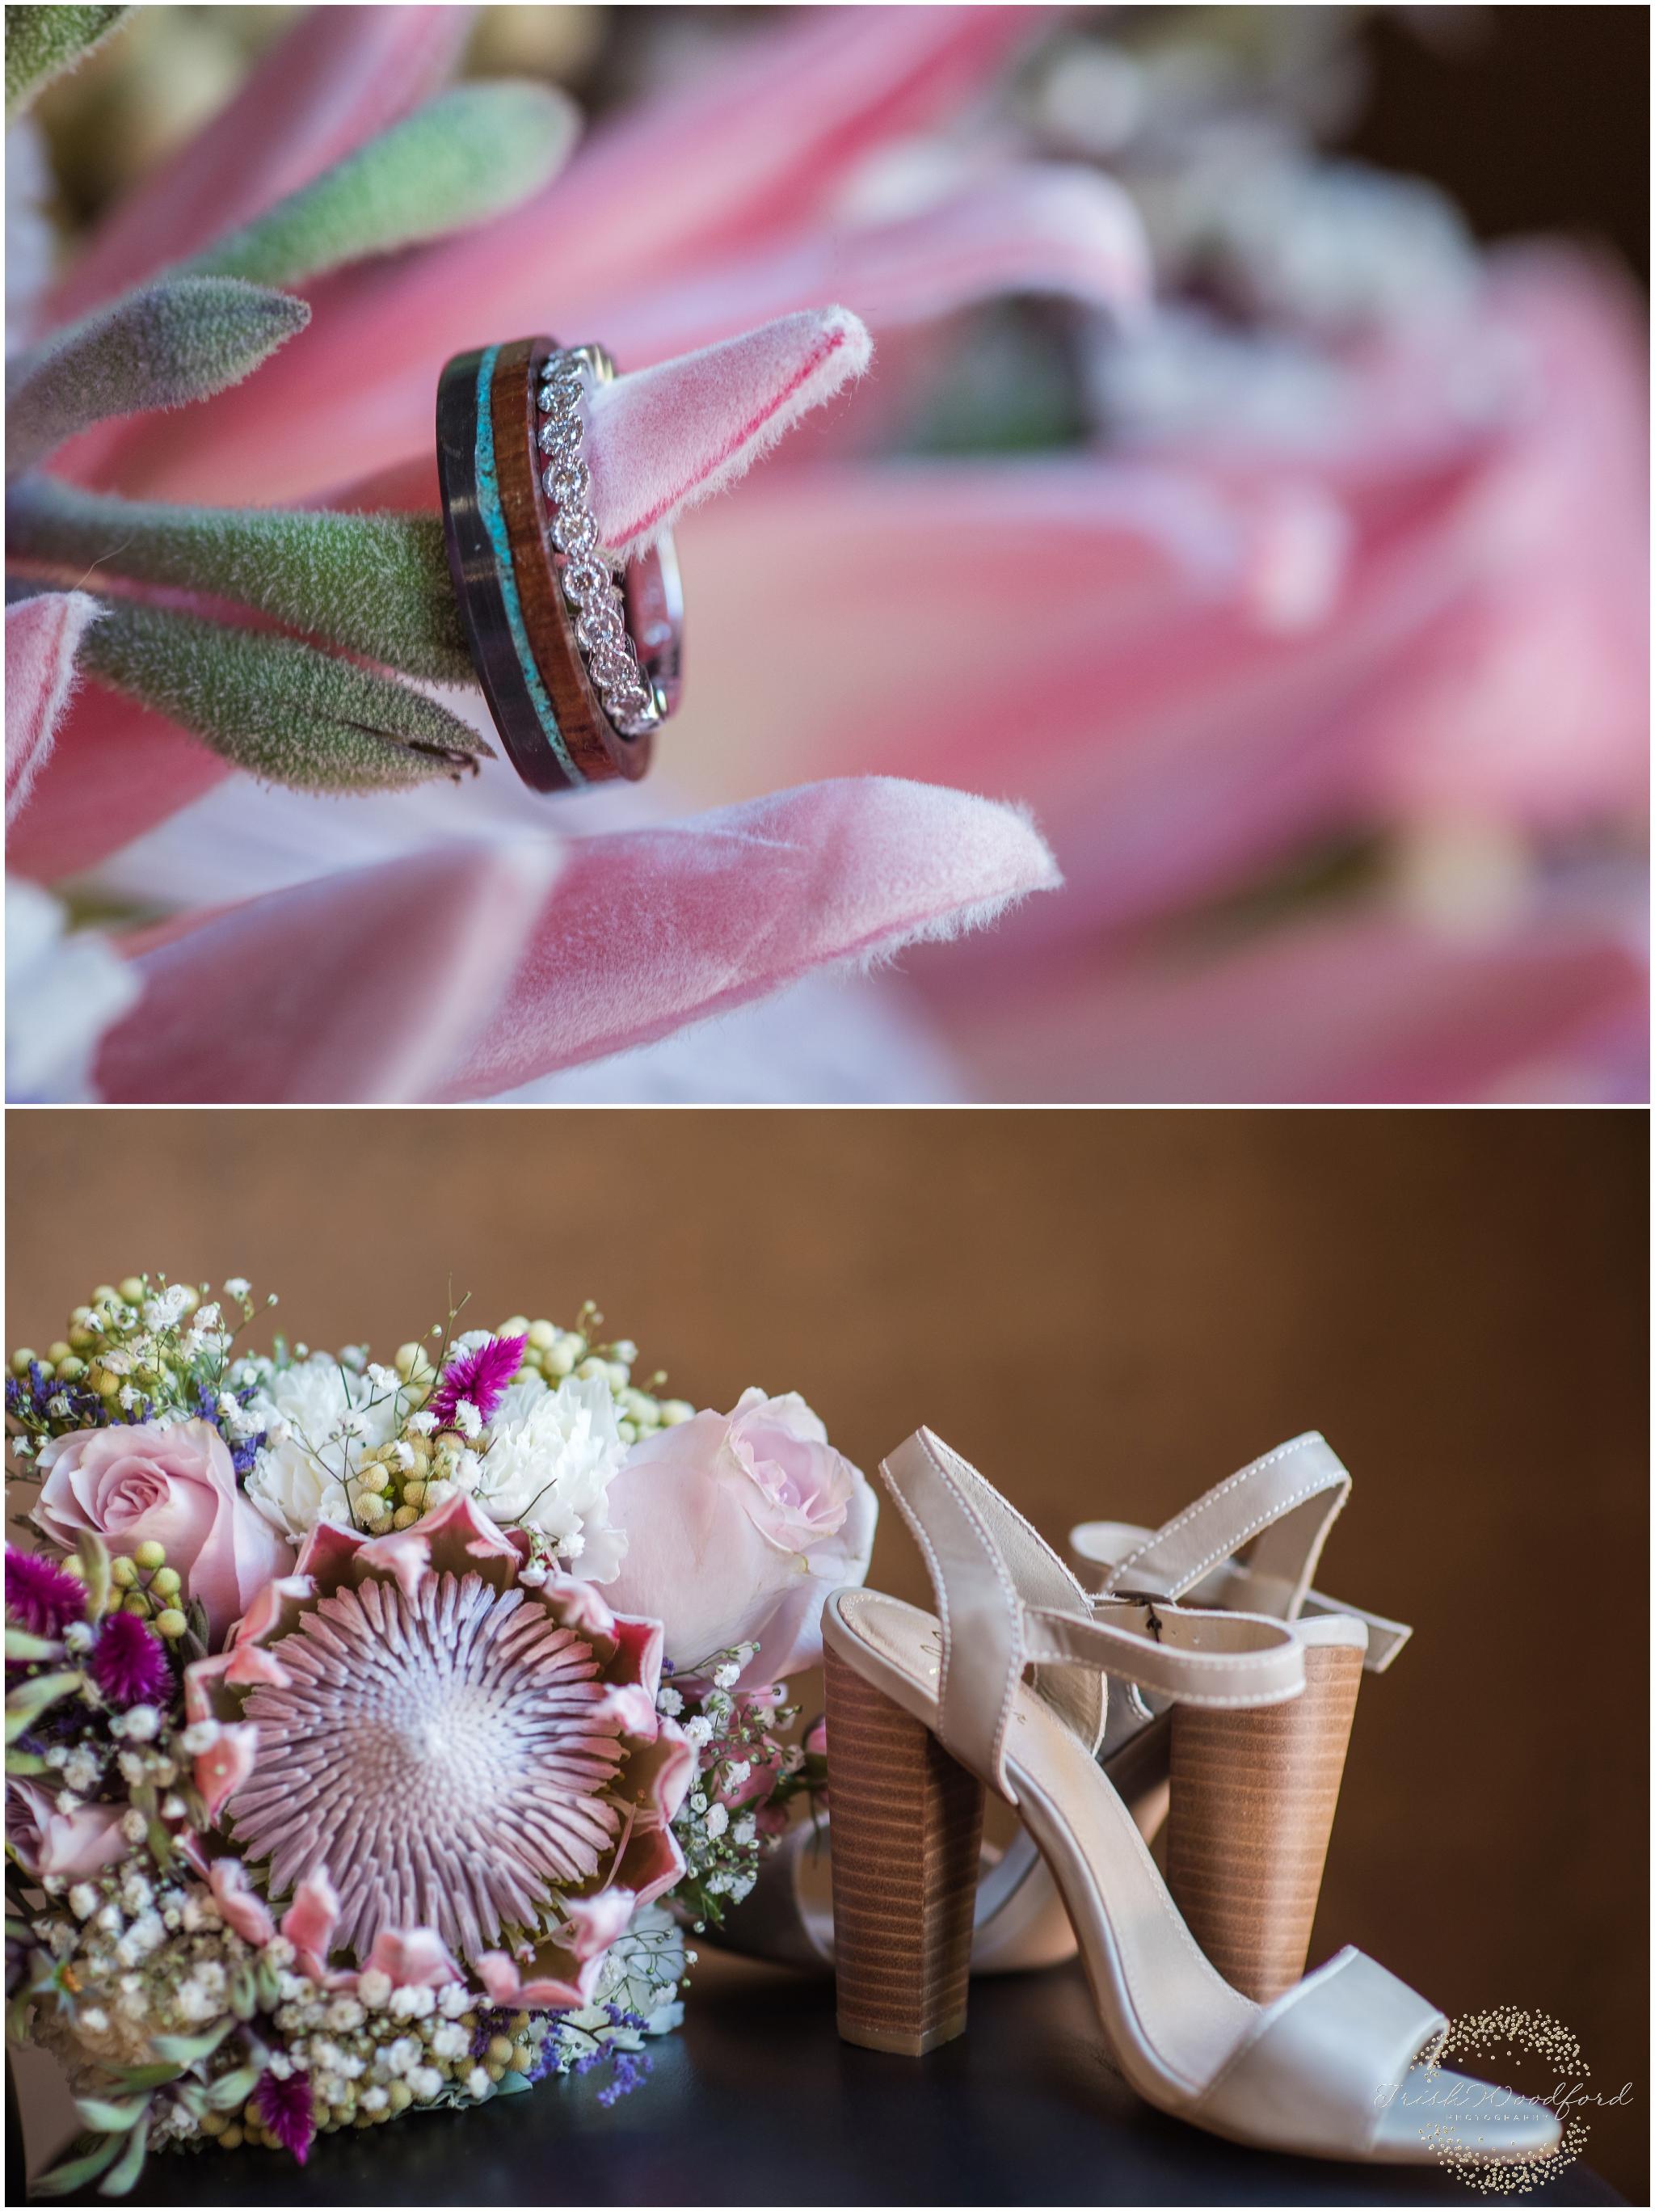 Wedding Ring & Bouquet Margaret River Wedding